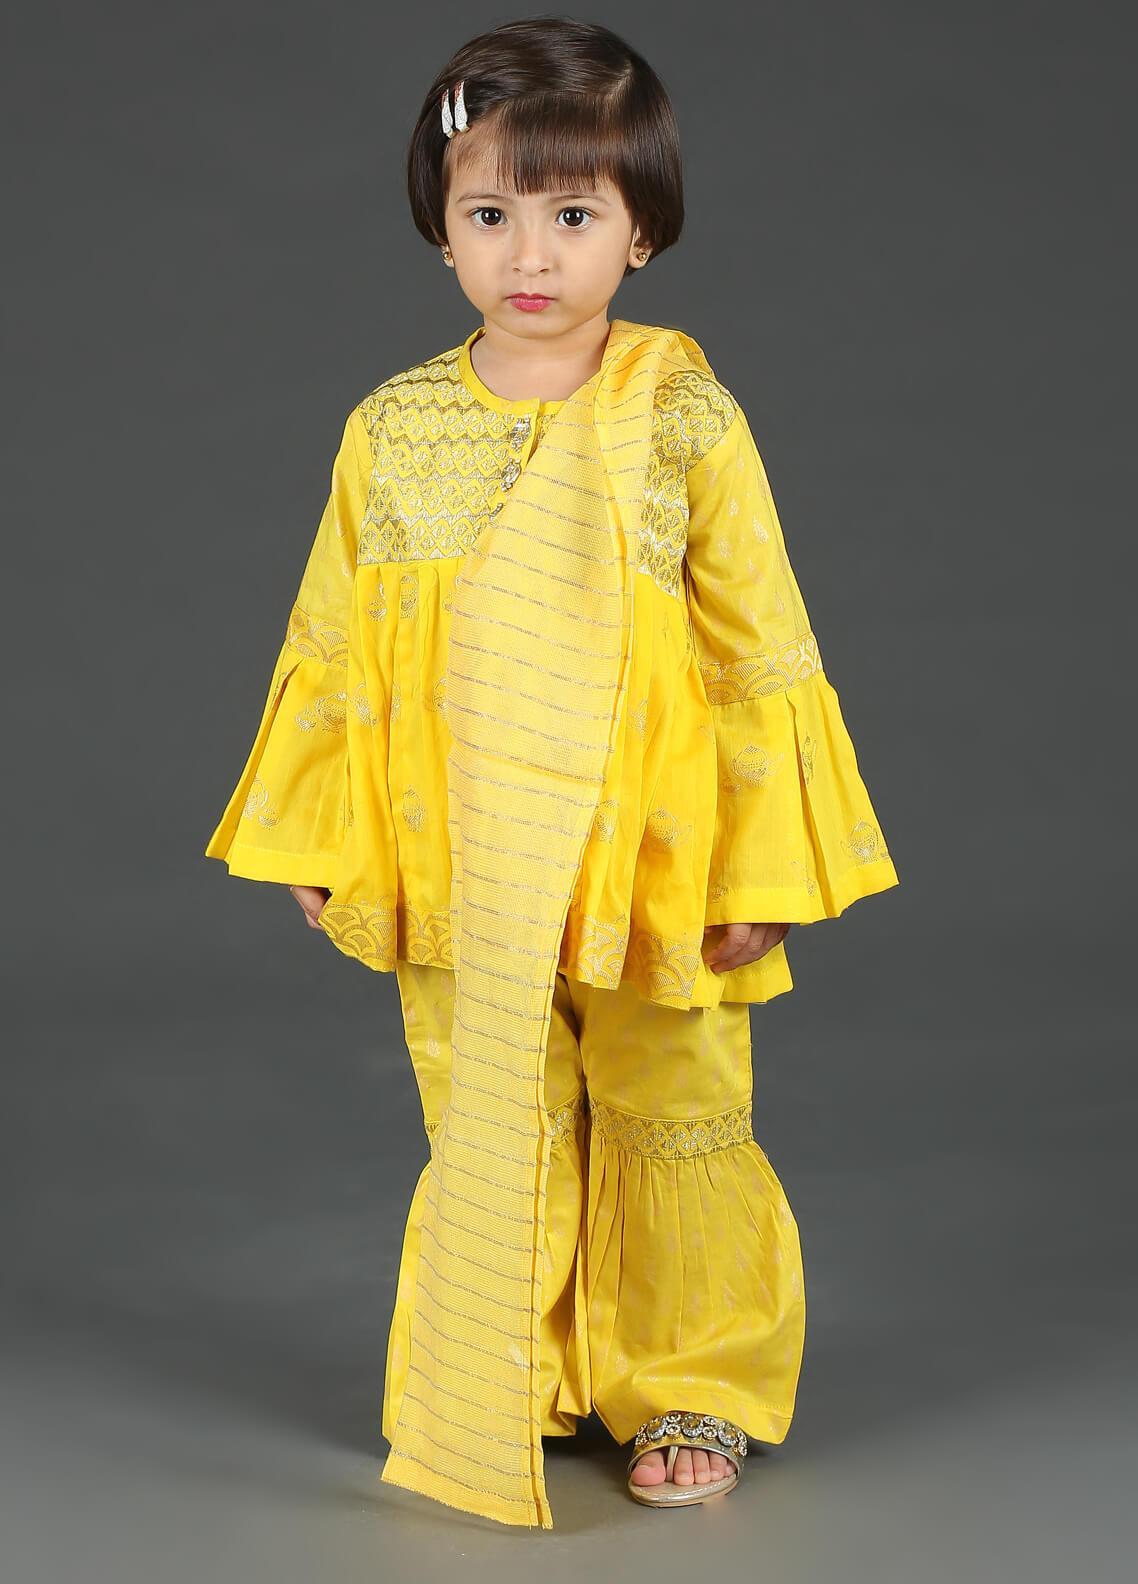 Senorita Cotton Net Fancy Girls 3 Piece Suit -  KBD-01235 Yellow